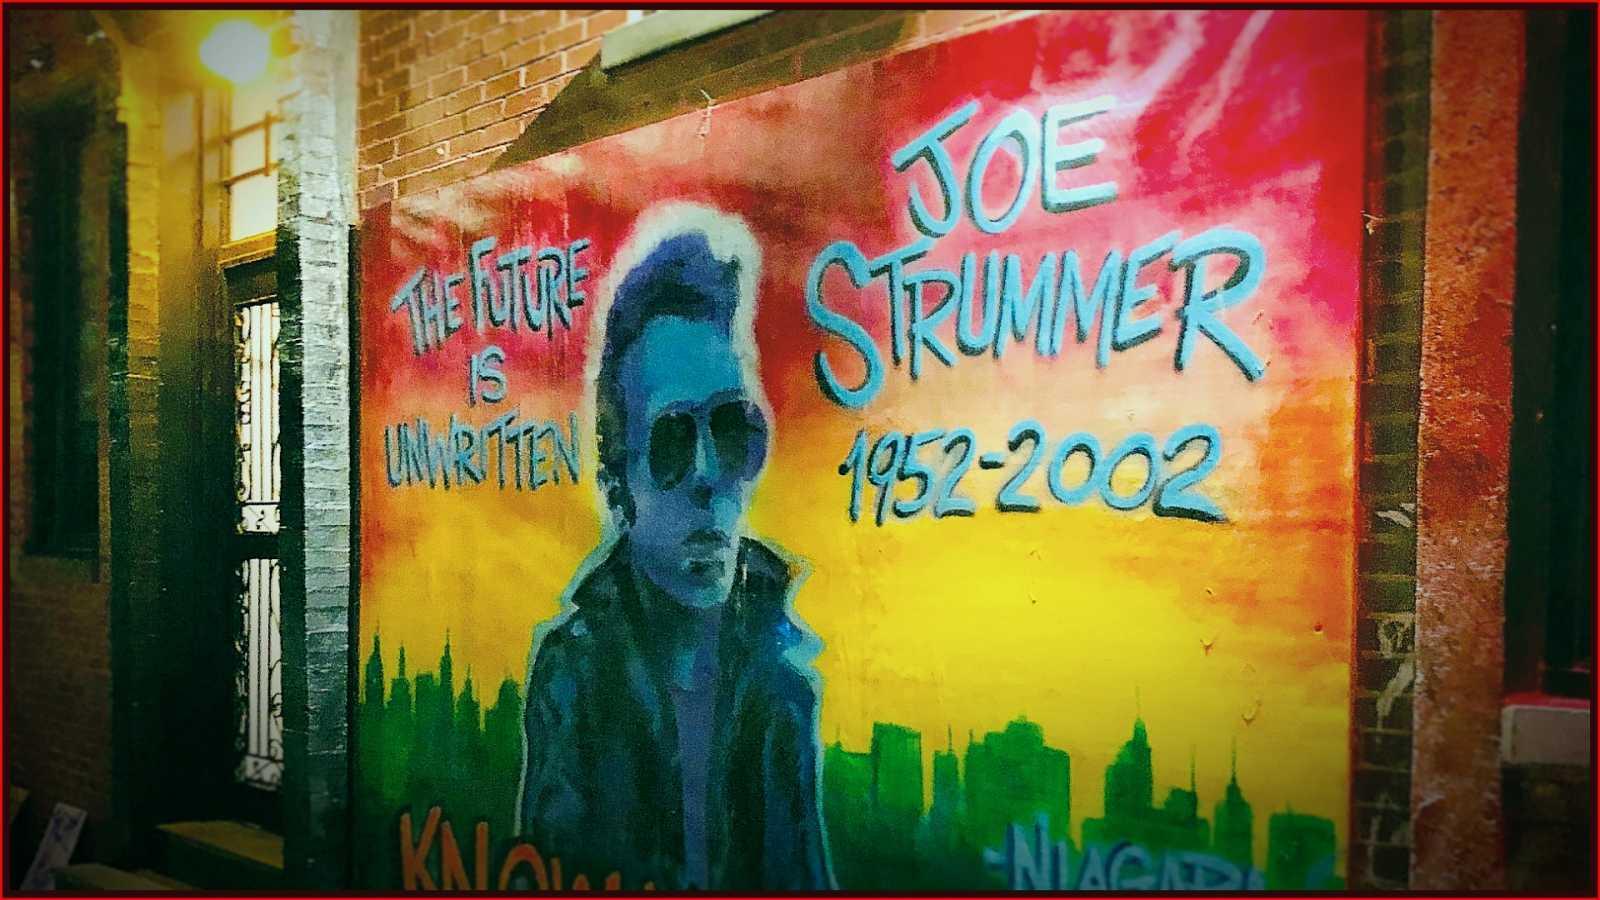 Bifonías - Joe Strummer: El ferretero del Punk - Escuchar ahora